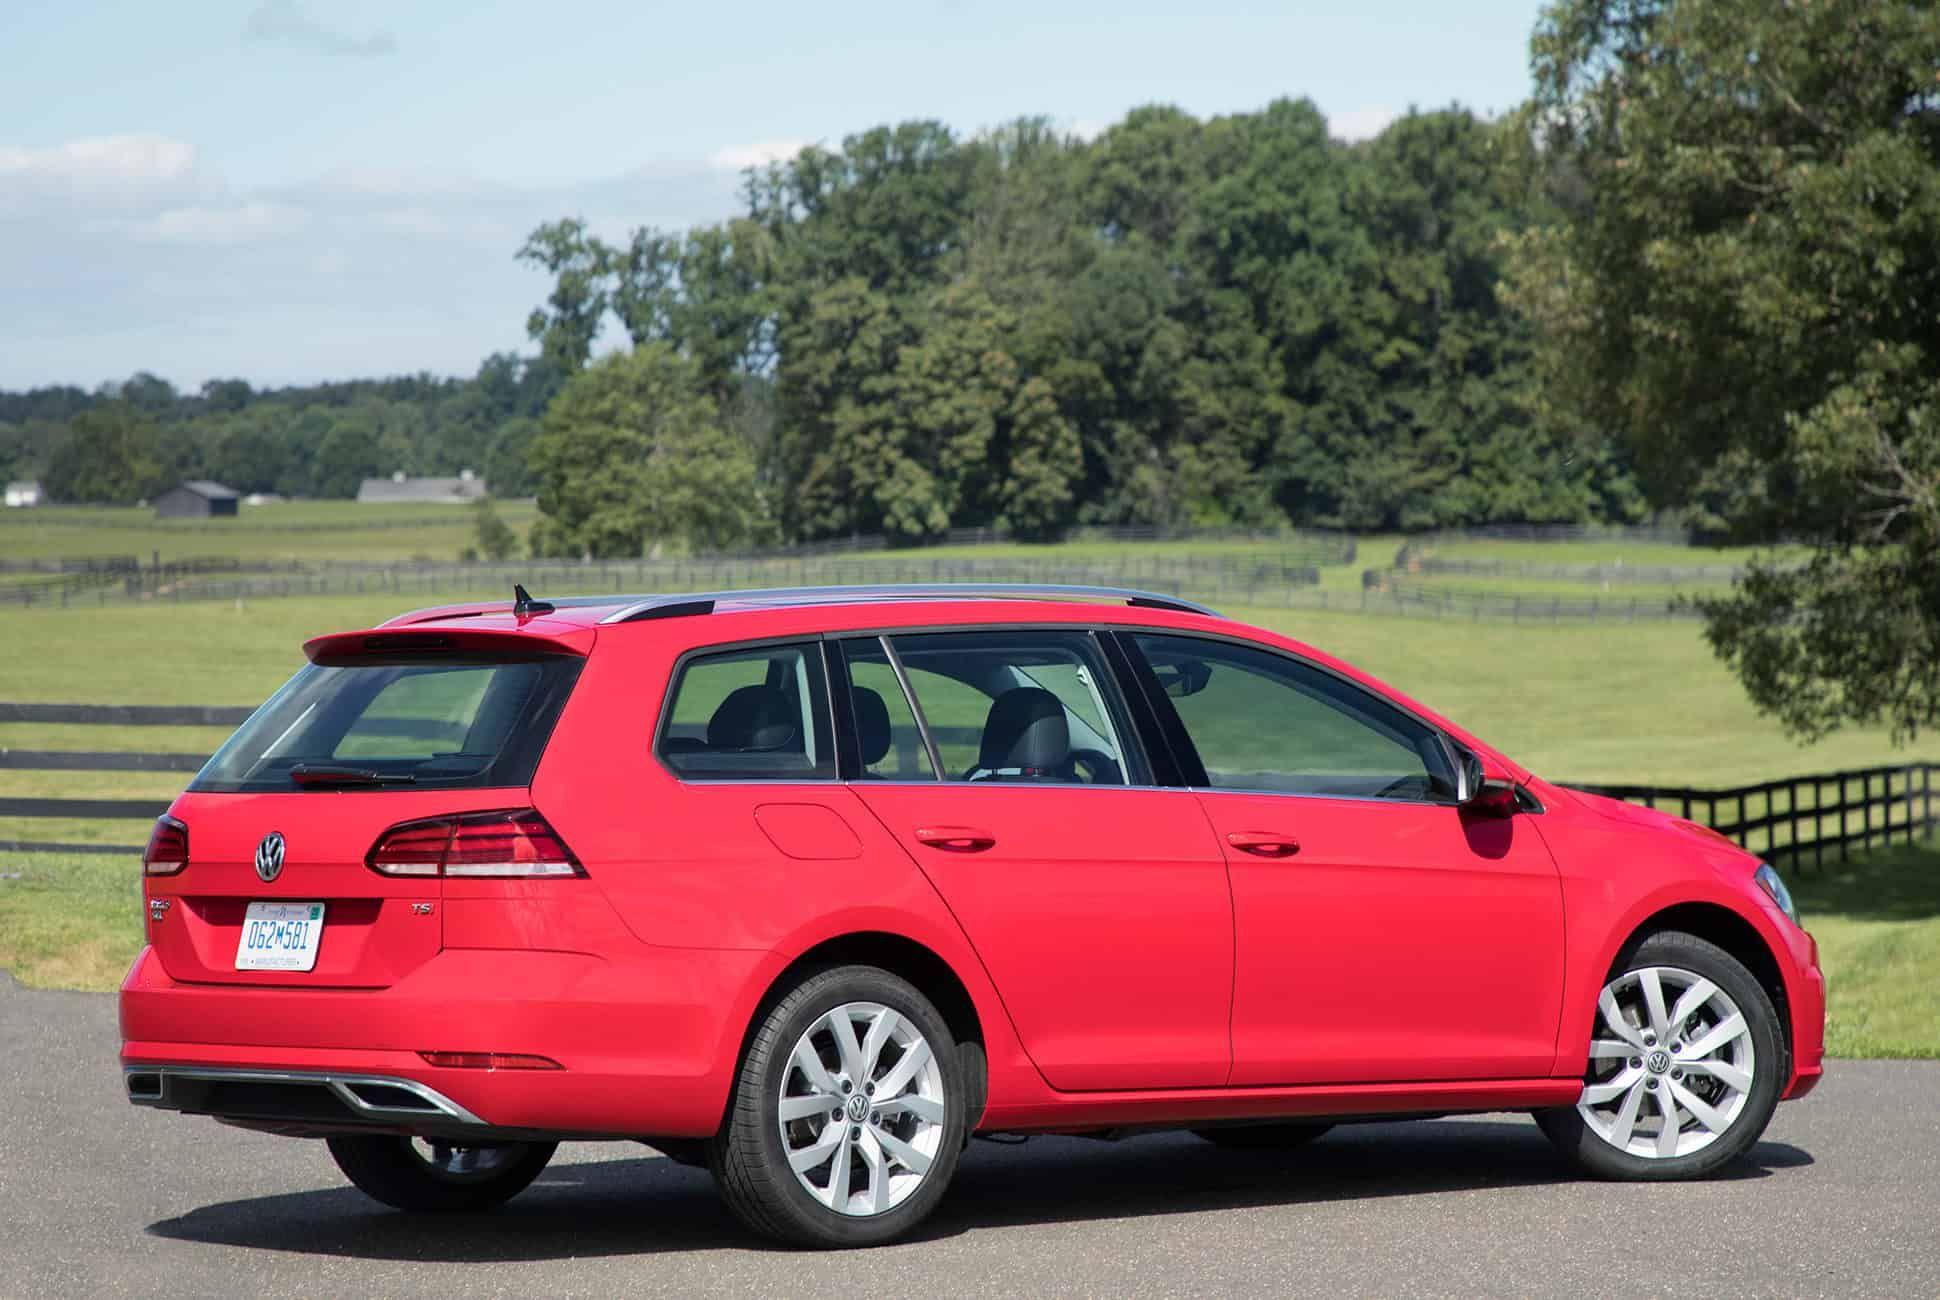 Volkswagen-Sportwagen-Review-gear-patrol-slide-2